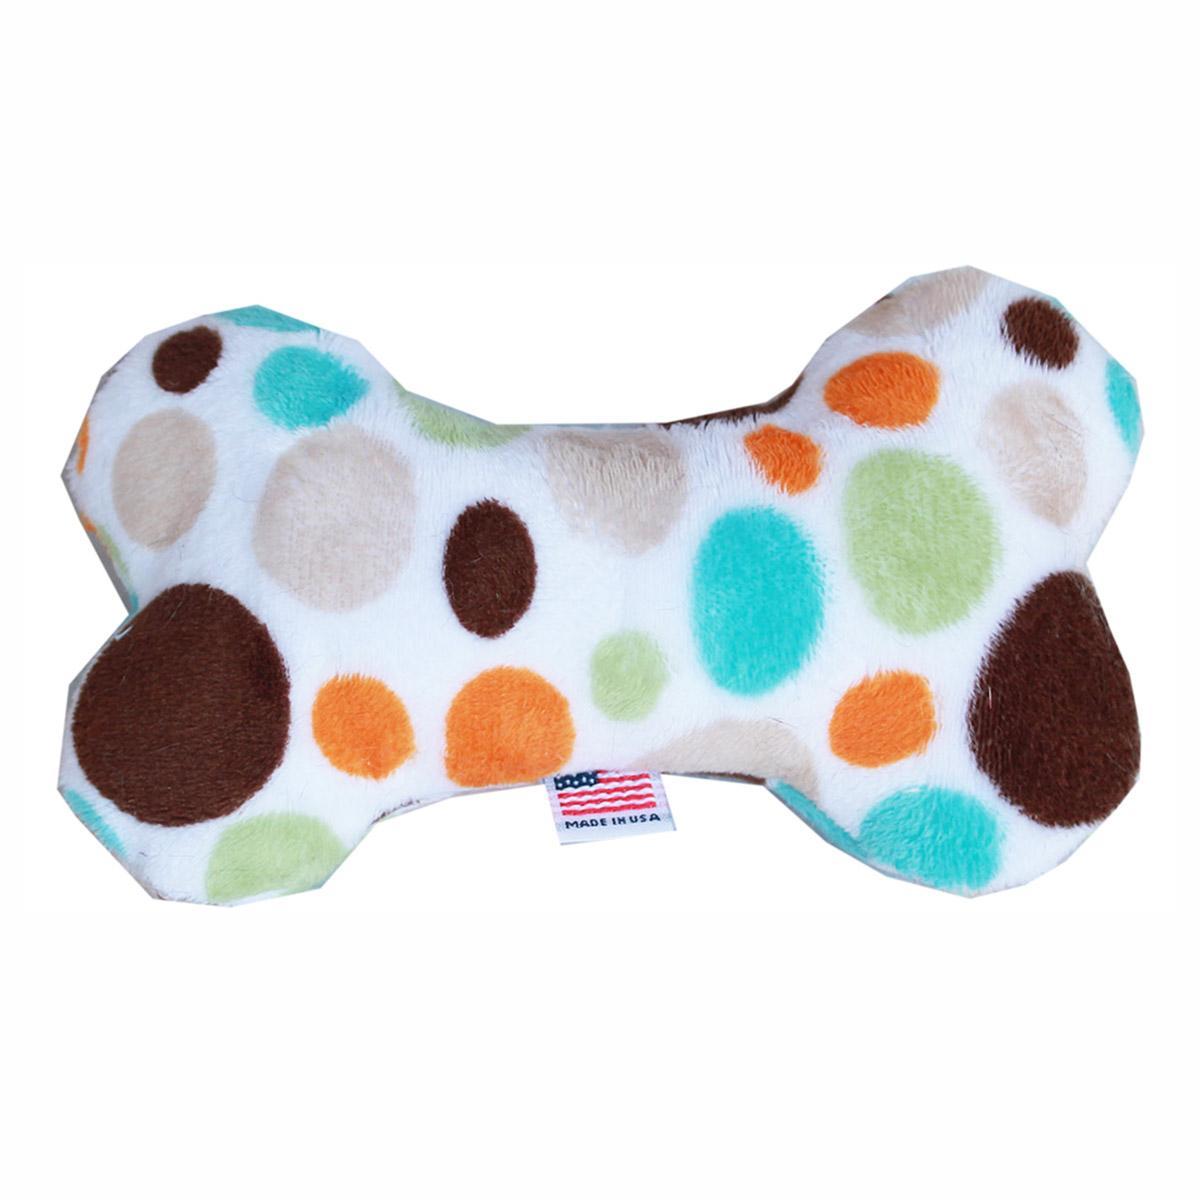 Plush Bone Dog Toy - Fall Party Dots